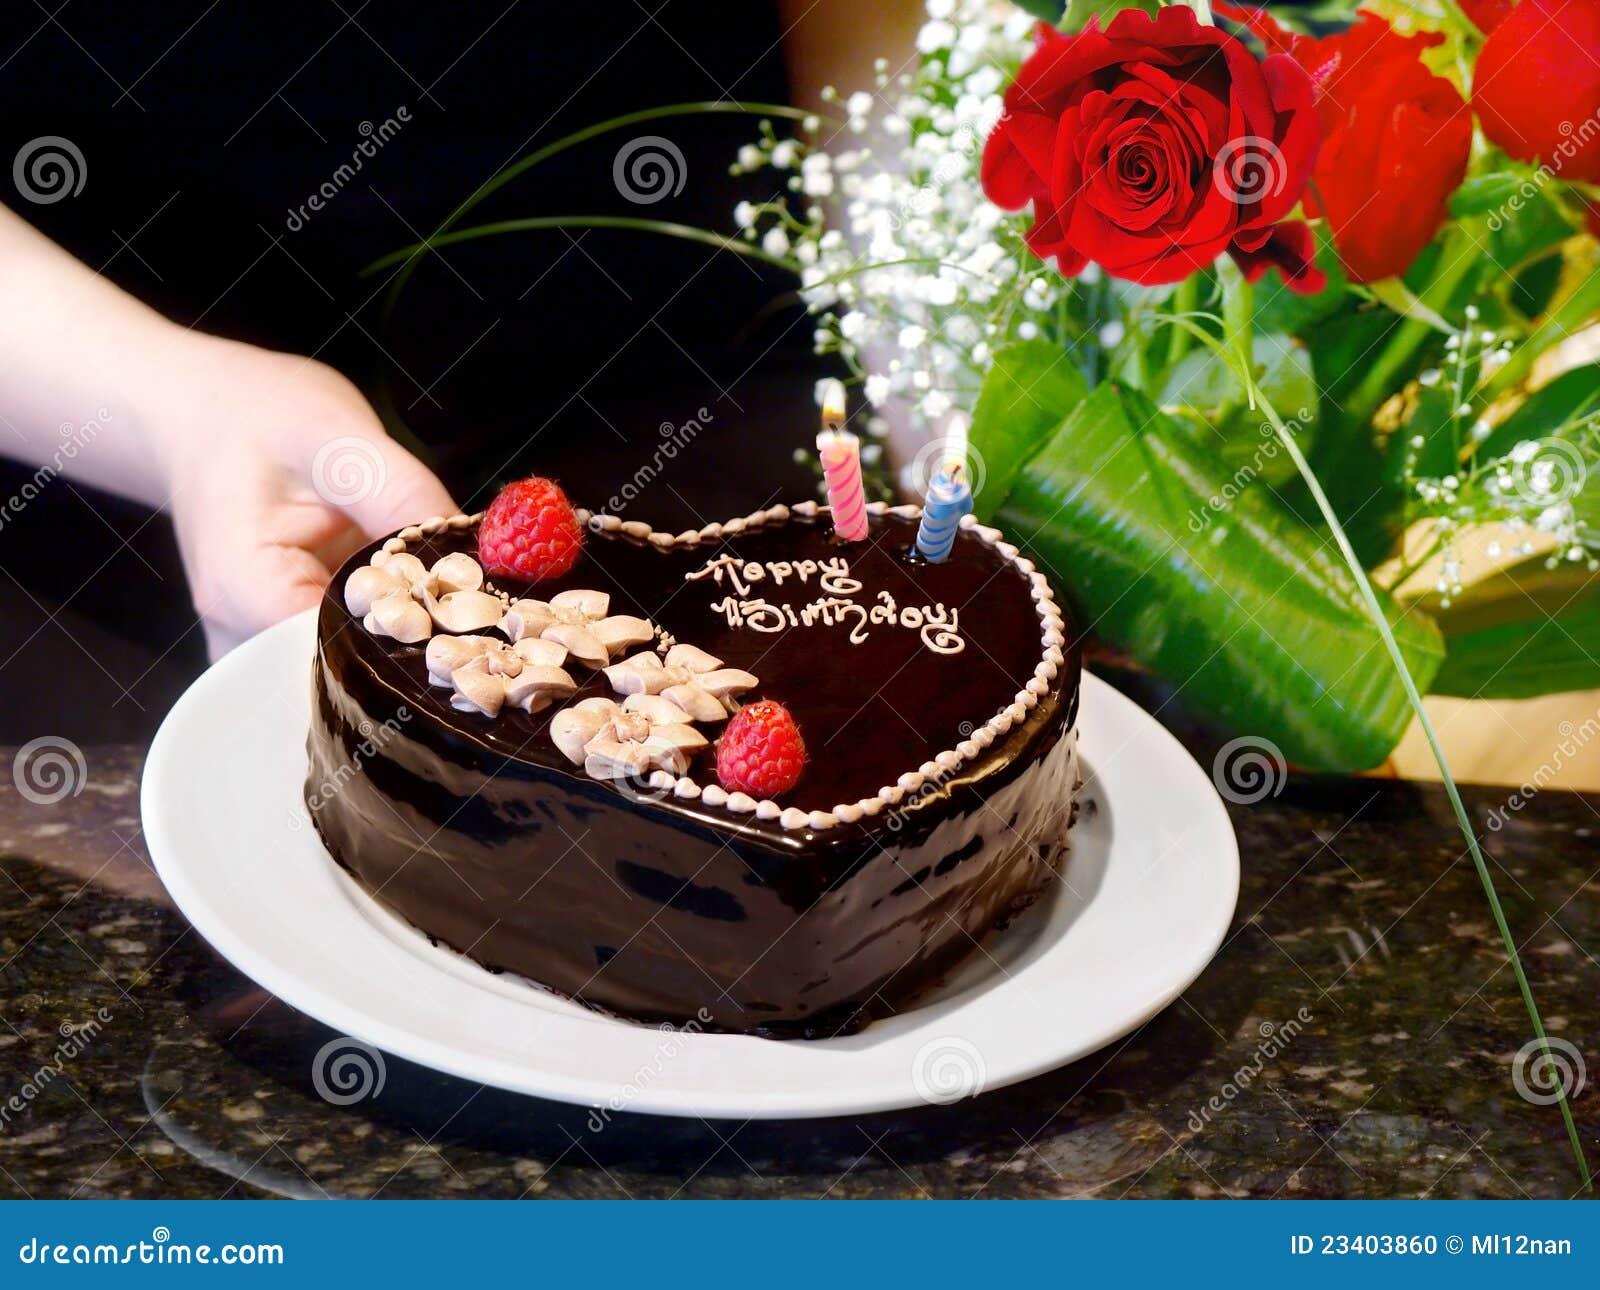 Birthday Cake And Roses Stock Photo Image Of Cream Plate 23403860